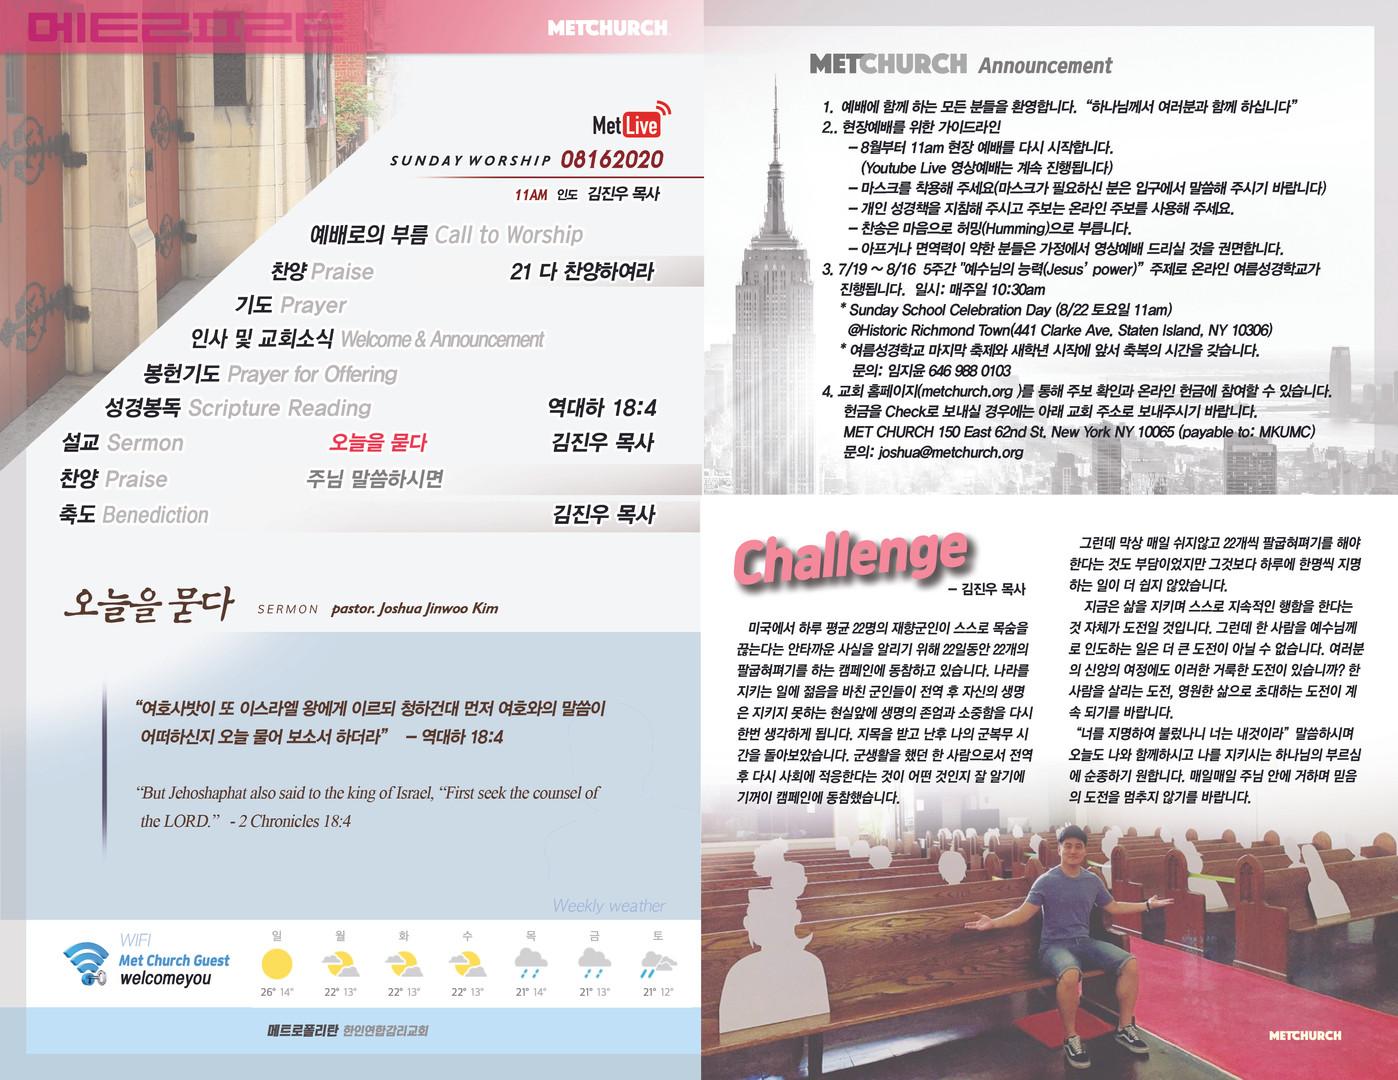 MetChurch_paper_Back_08162020.jpg